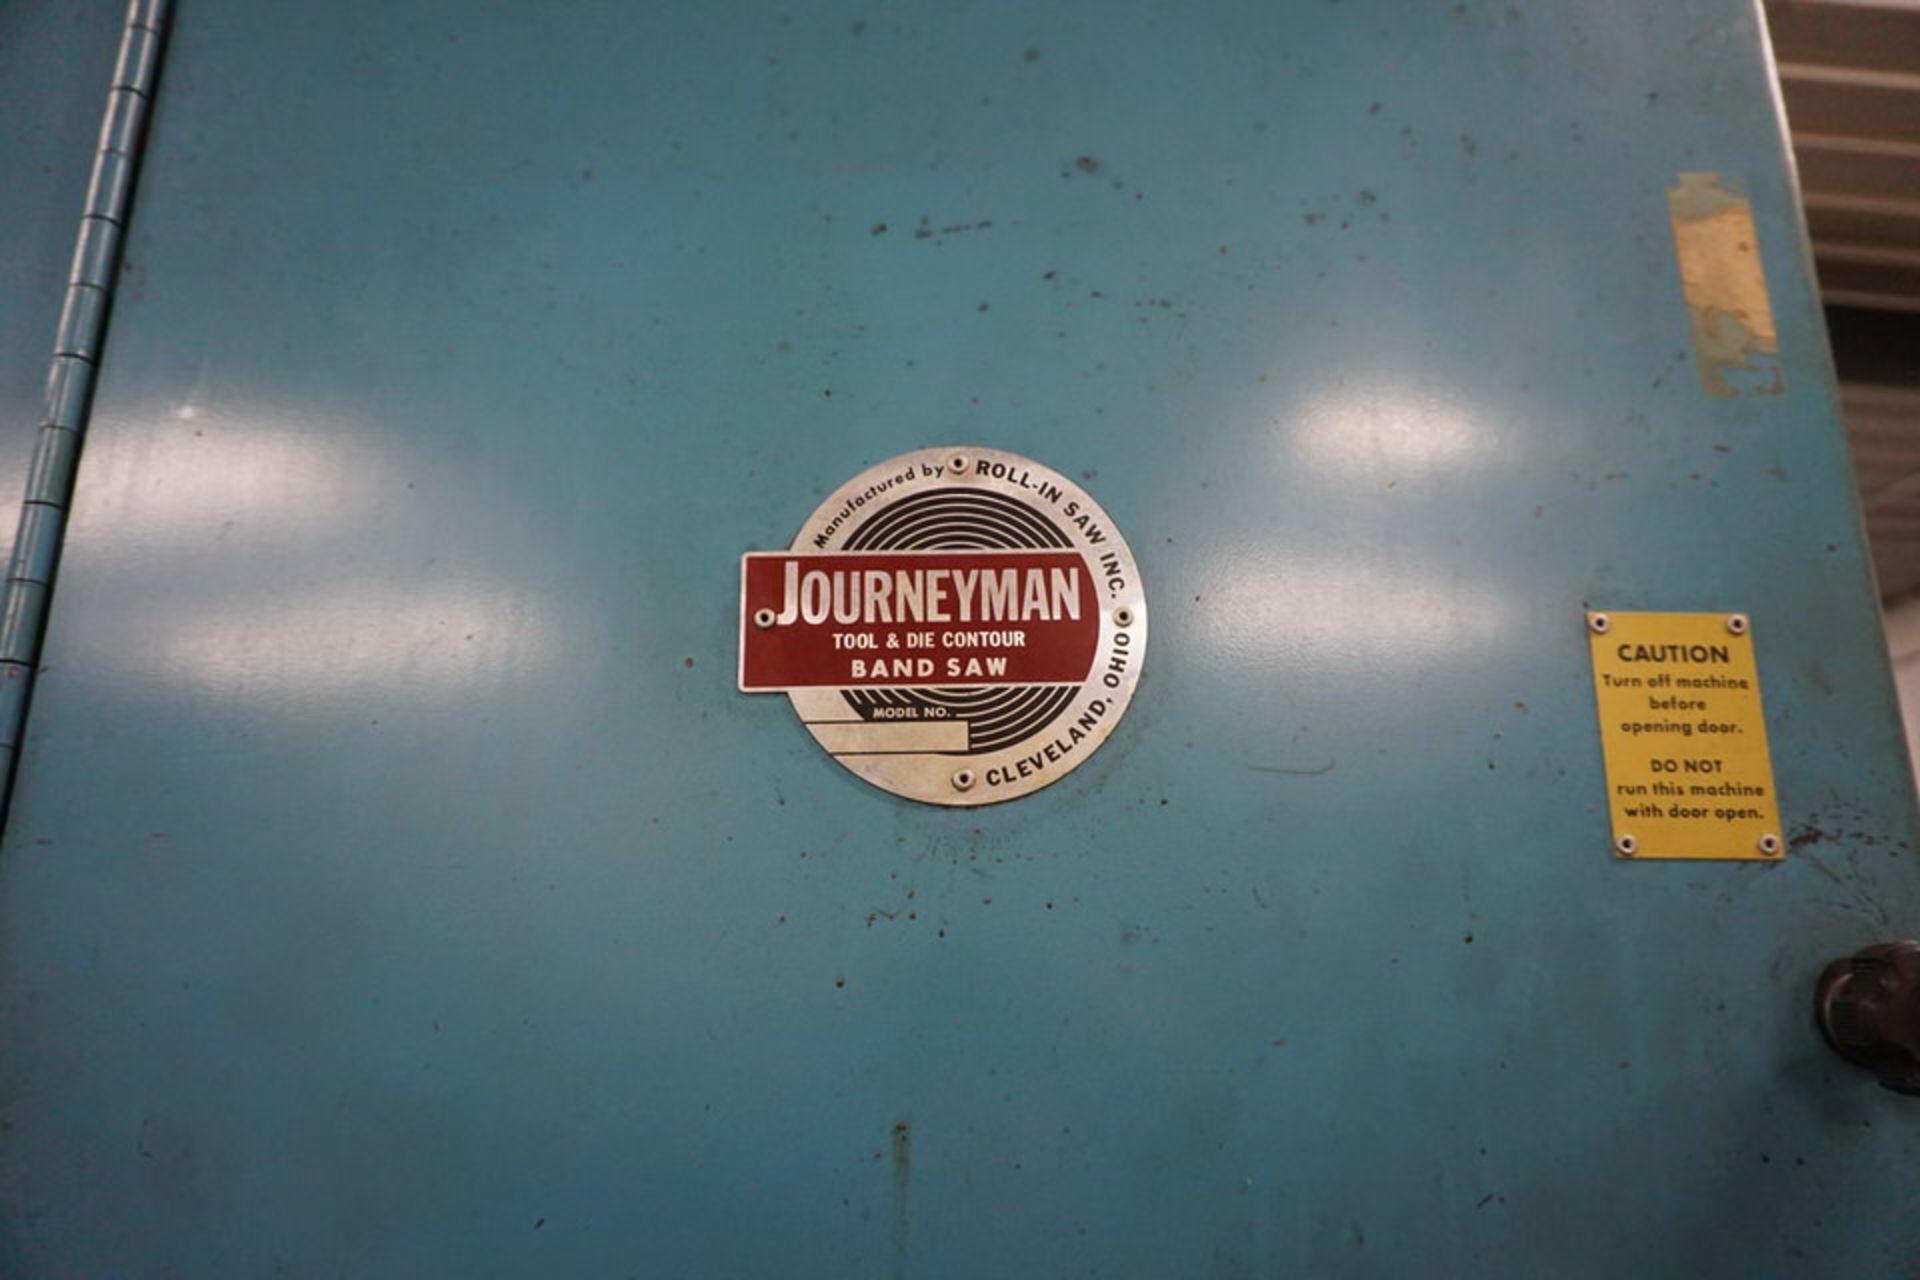 JOURNEYMAN TOOL & DIE CONTOUR BANDSAW - Image 5 of 6